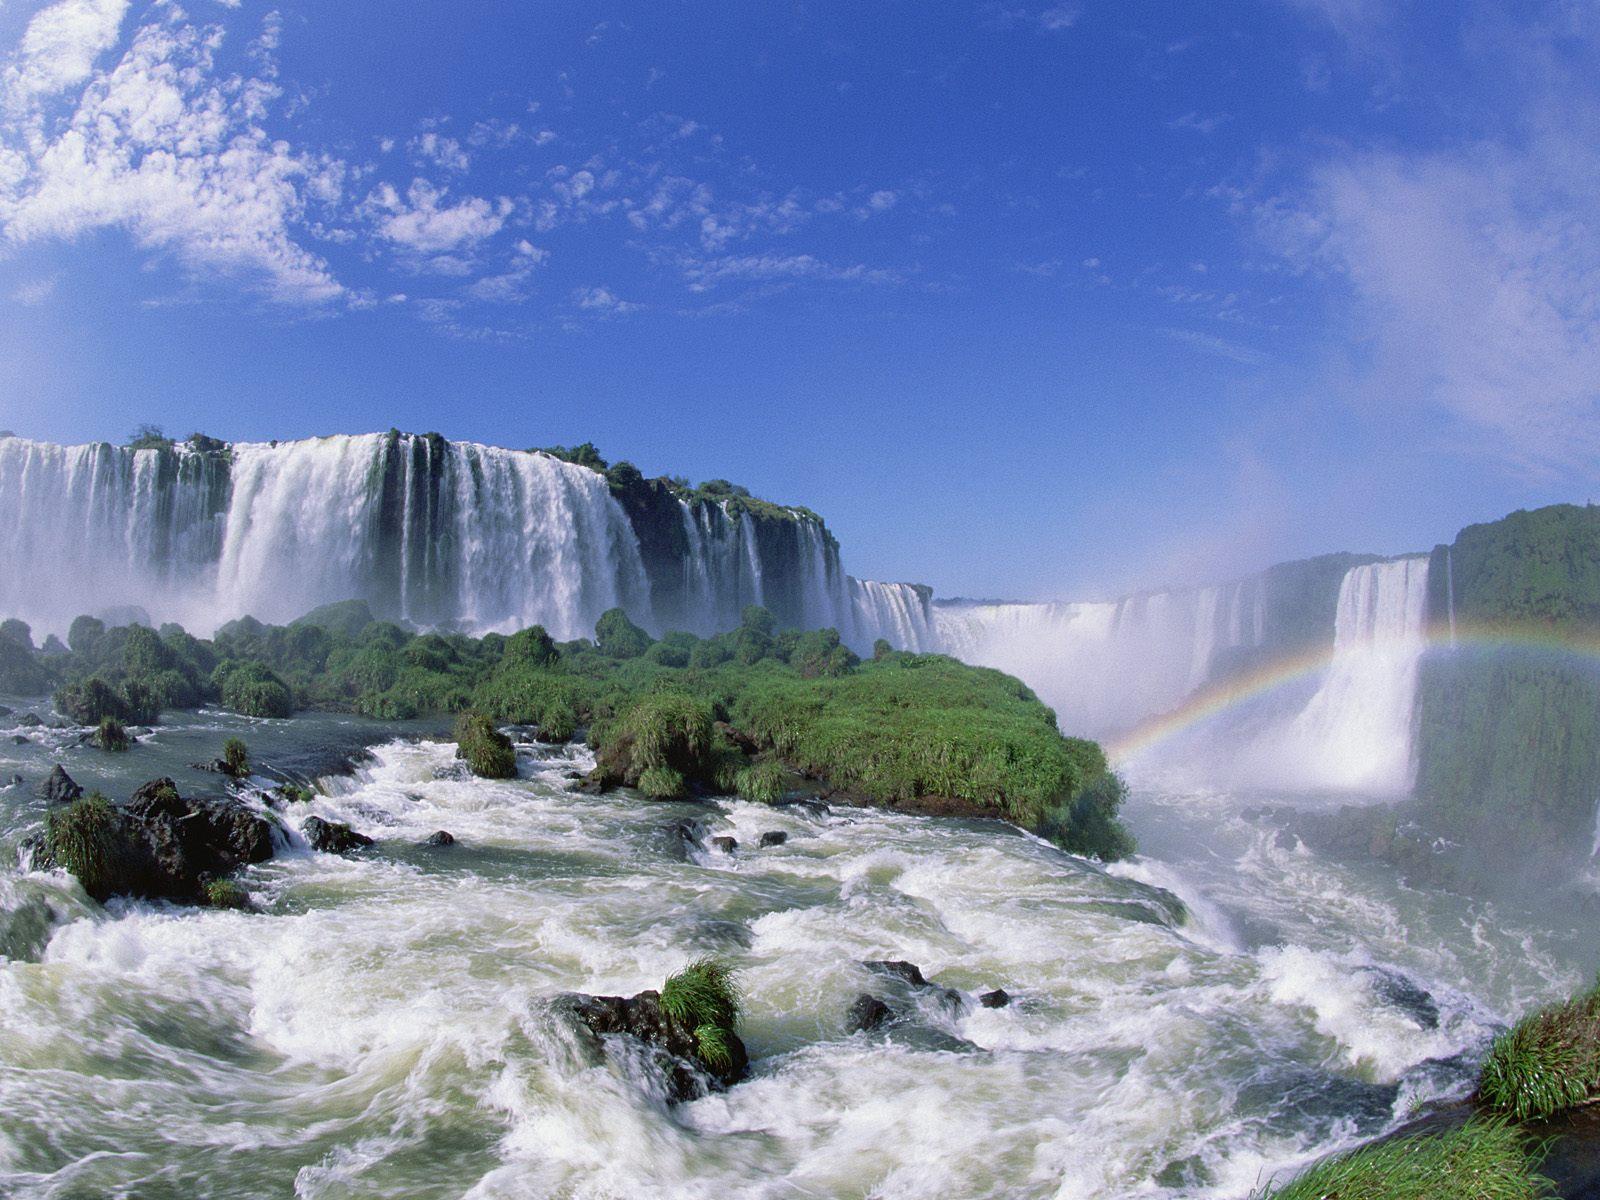 водопад чудес картинки сыграла